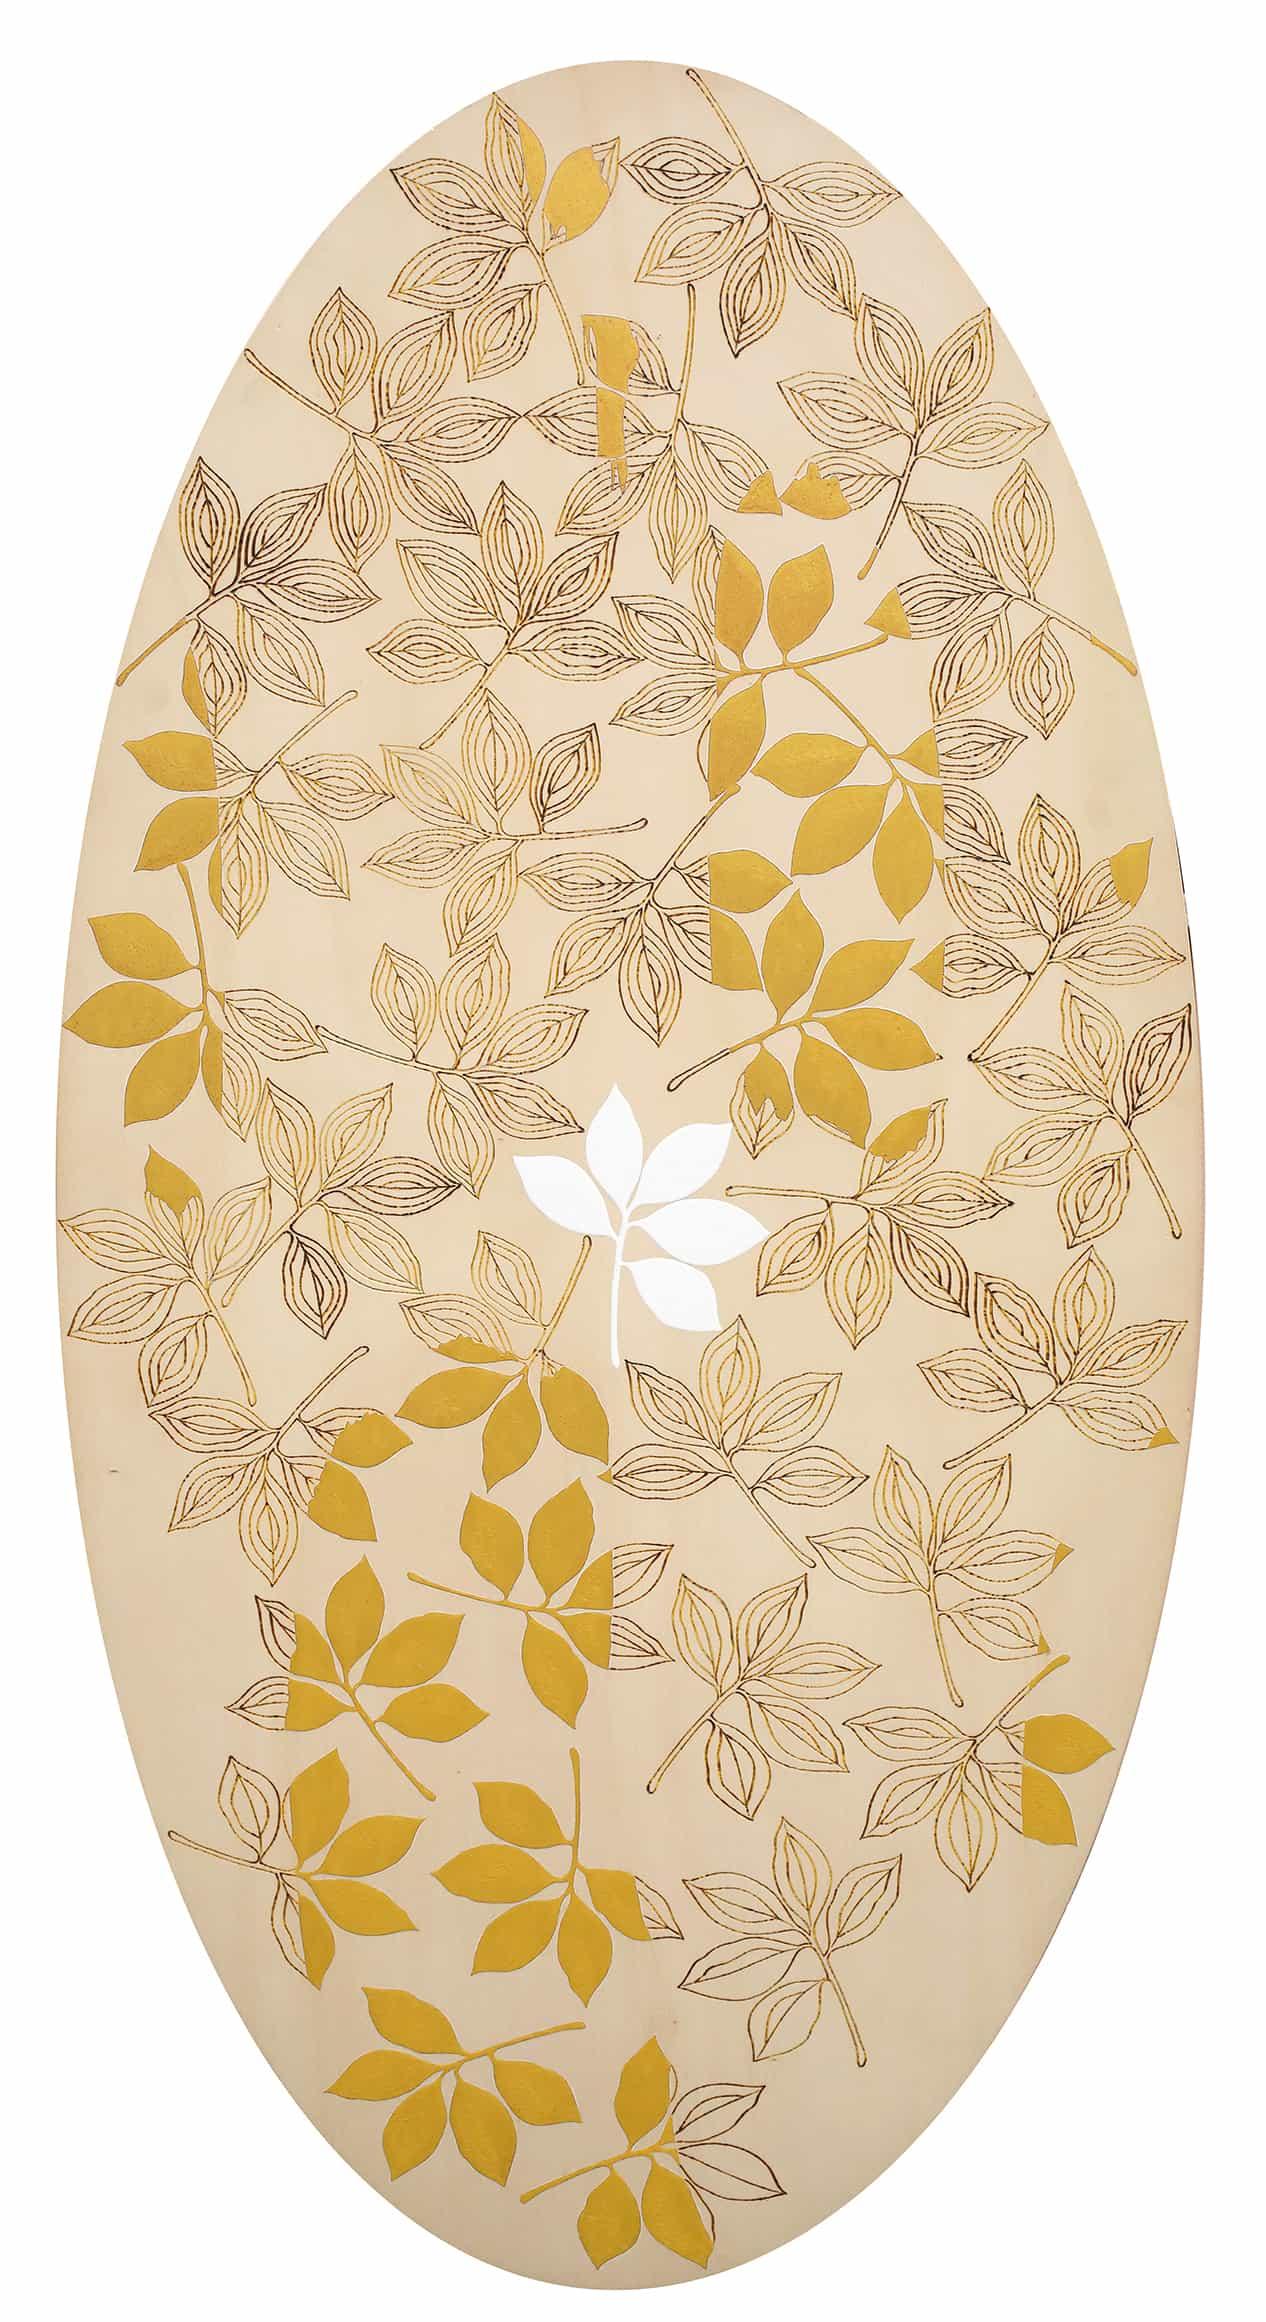 Giuseppe Salvatori - Ver sacrum, 2006 - Tempera, oro e incisioni su tavola, cm 140x70